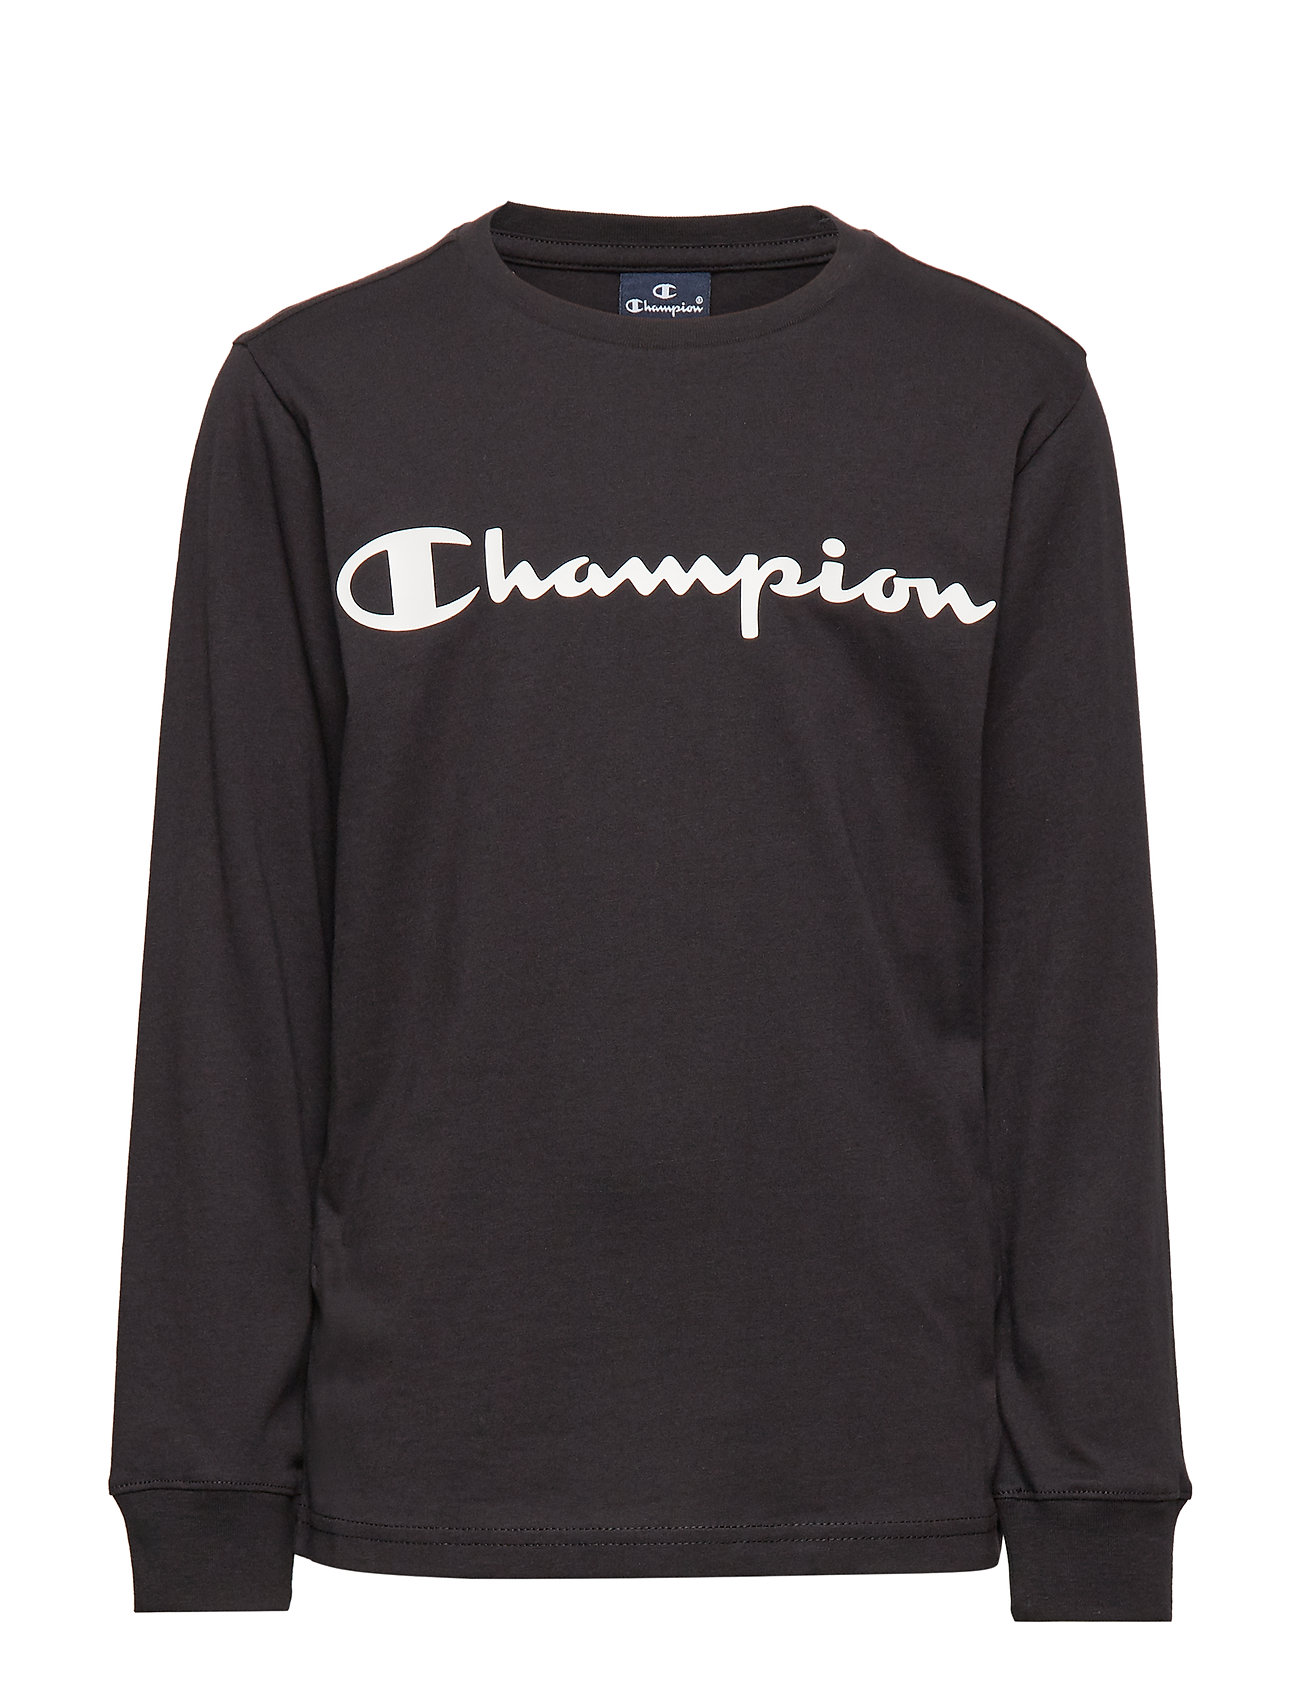 Champion Crewneck Long Sleeve T-Shirt - BLACK BEAUTY